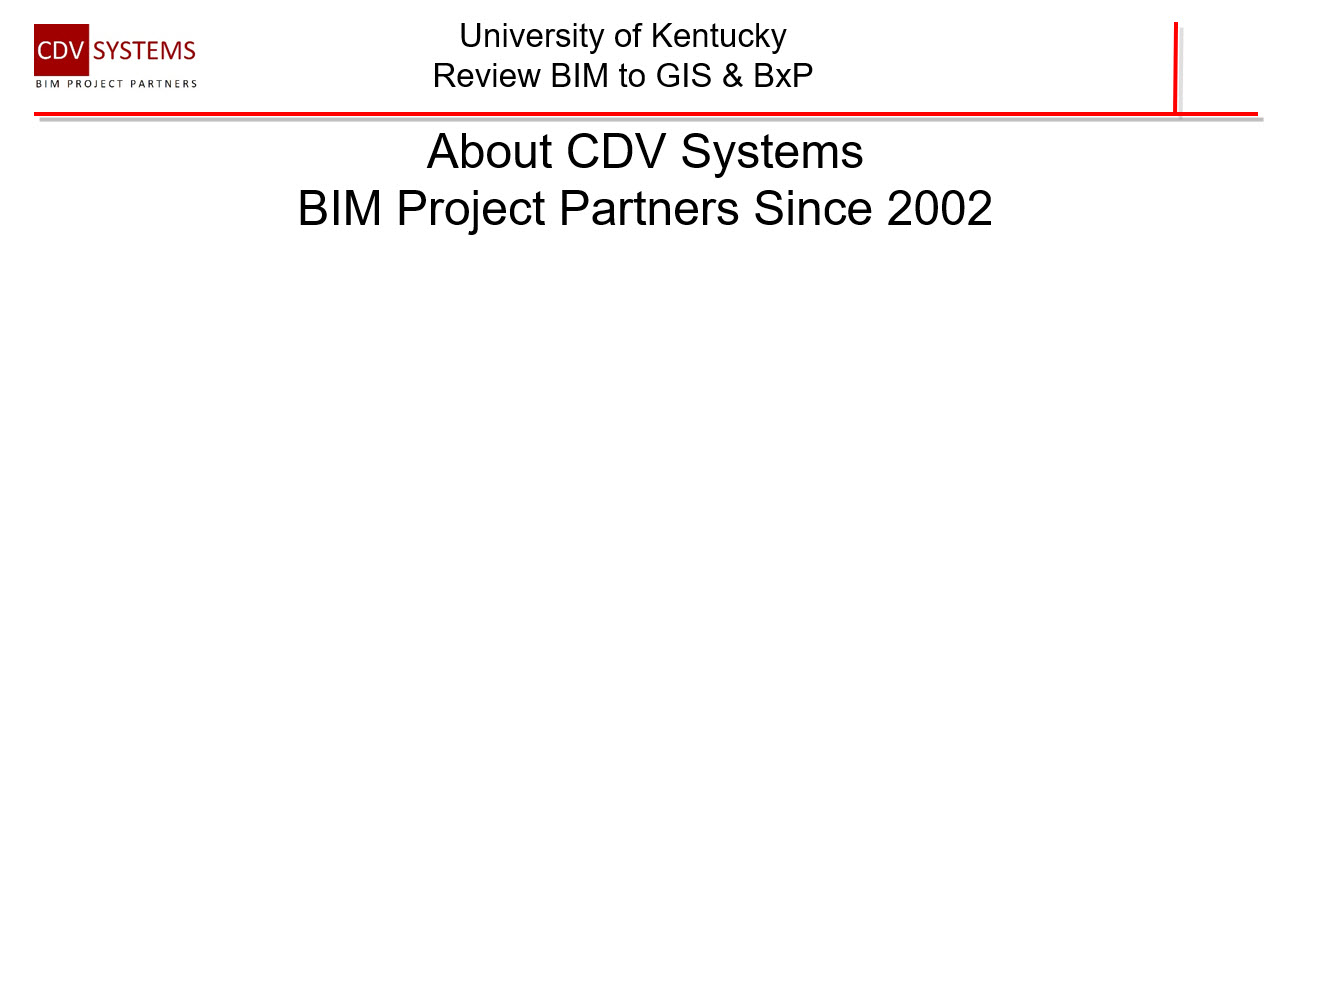 University of Kentucky_001b.jpg